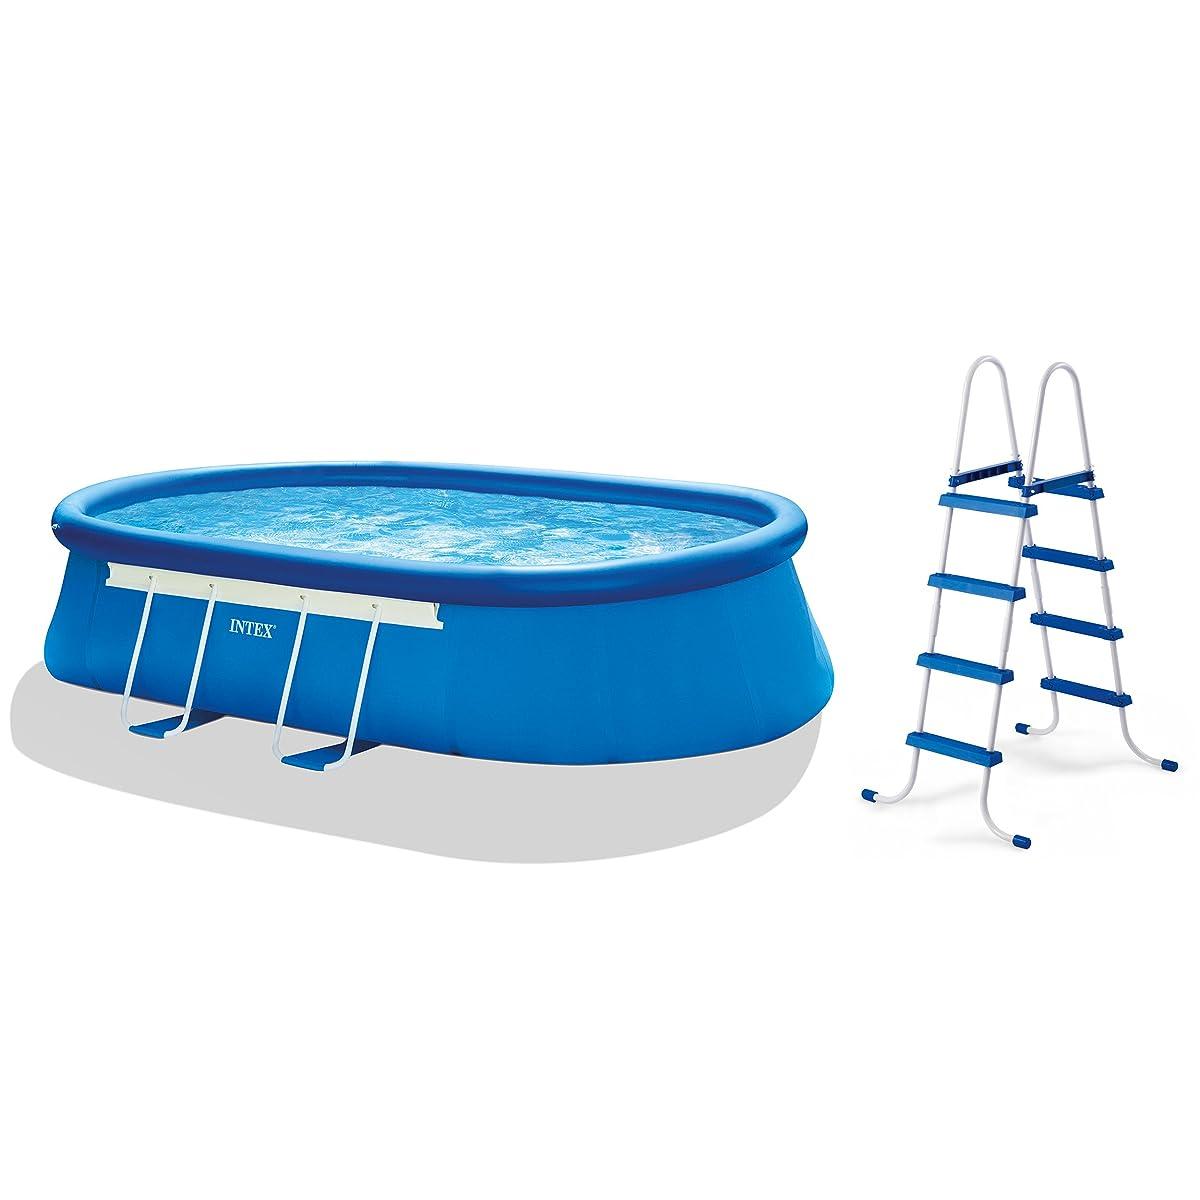 Intex Oval Frame Pool Set, 18-Feet by 10-Feet by 42-Inch (Older Model)